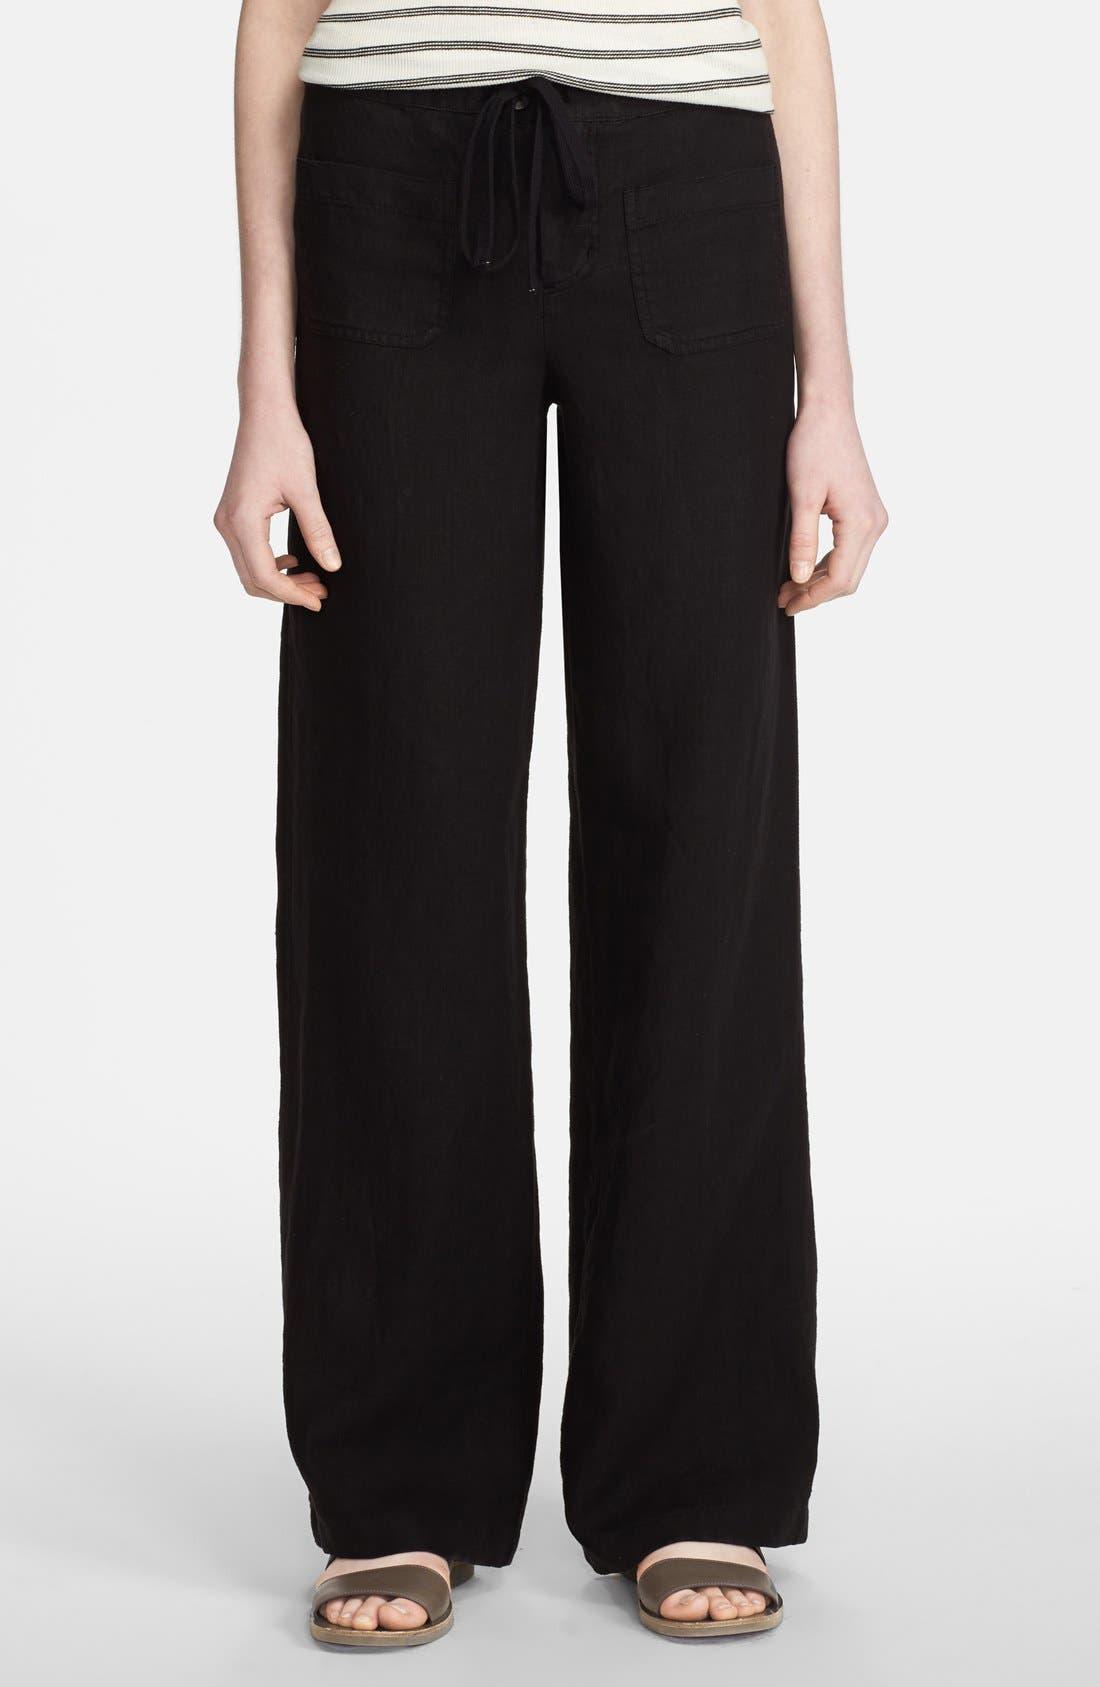 Main Image - Vince 'Beach' Linen Pants